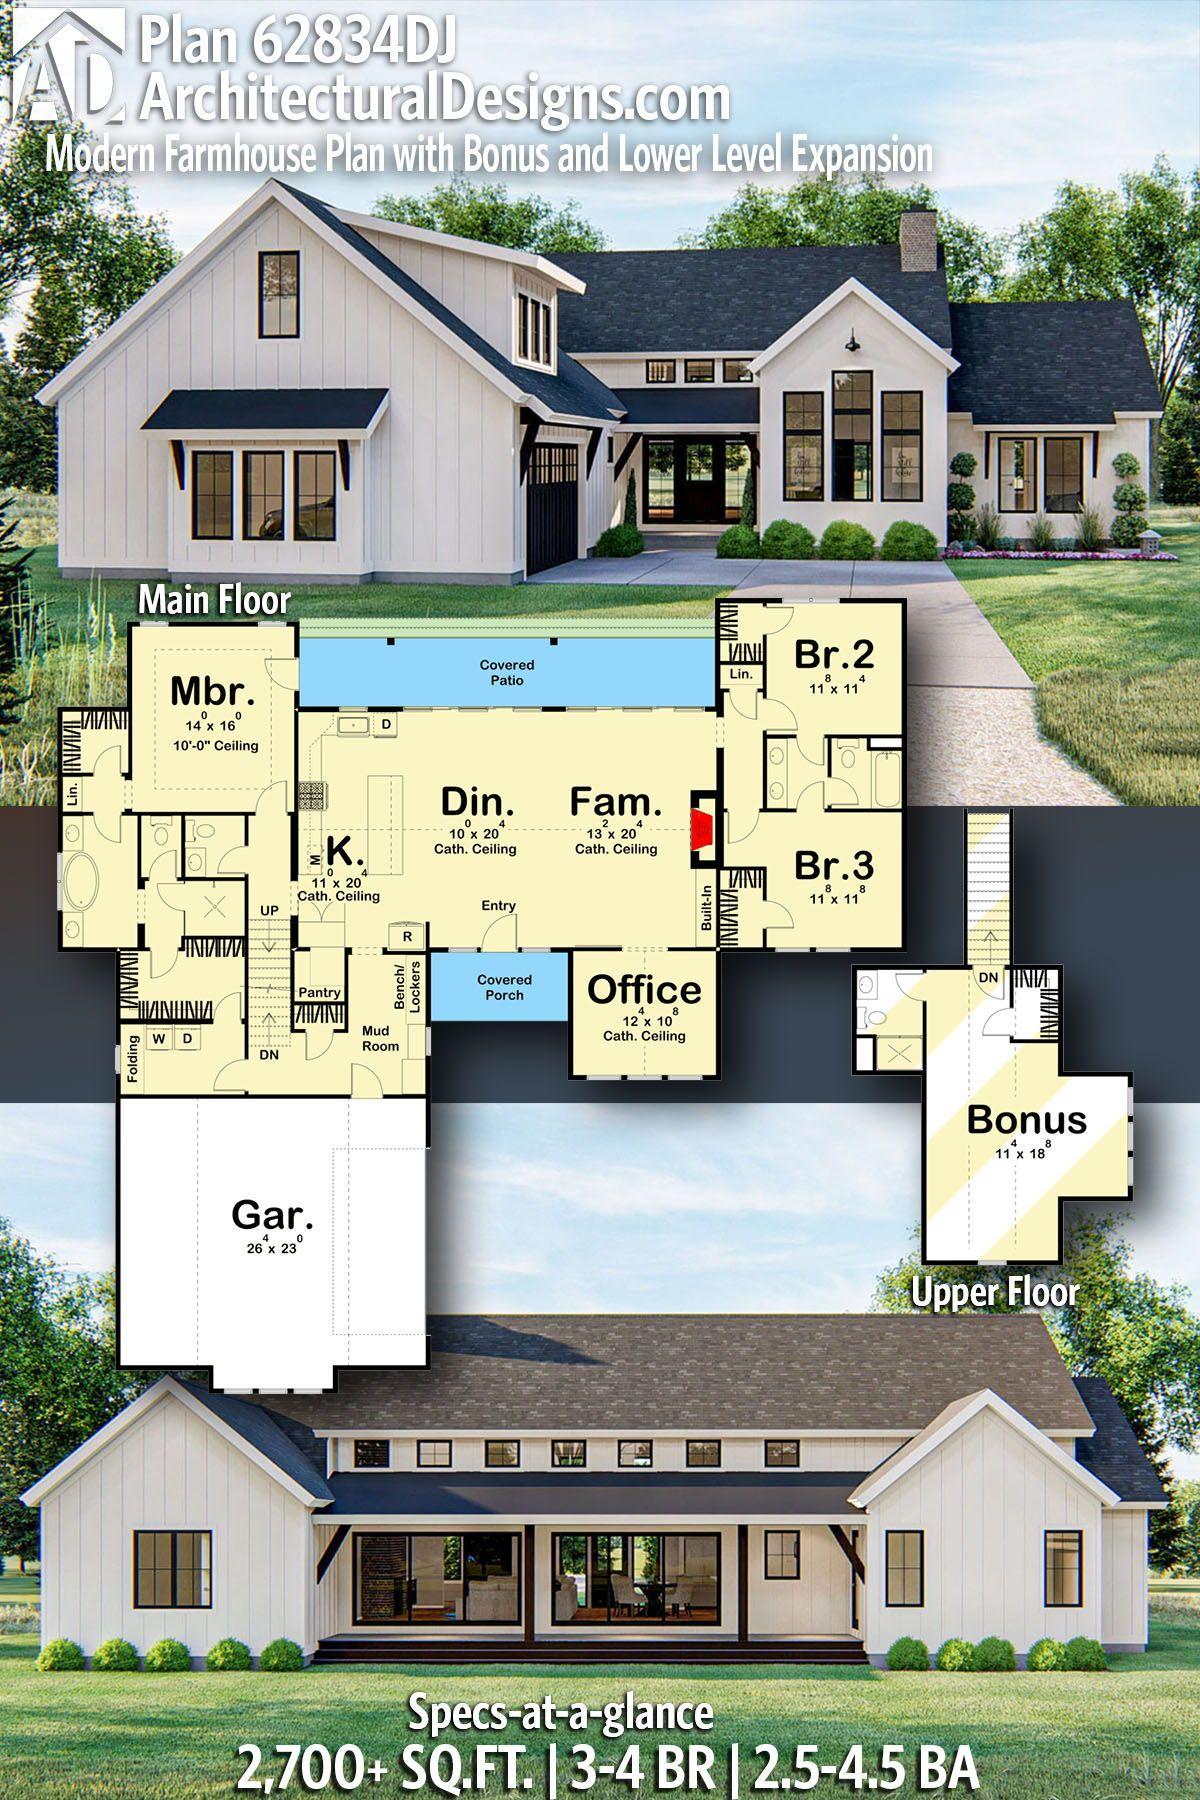 Plan 62834DJ: Modern Farmhouse Plan with Bonus and Lower Level Expansion